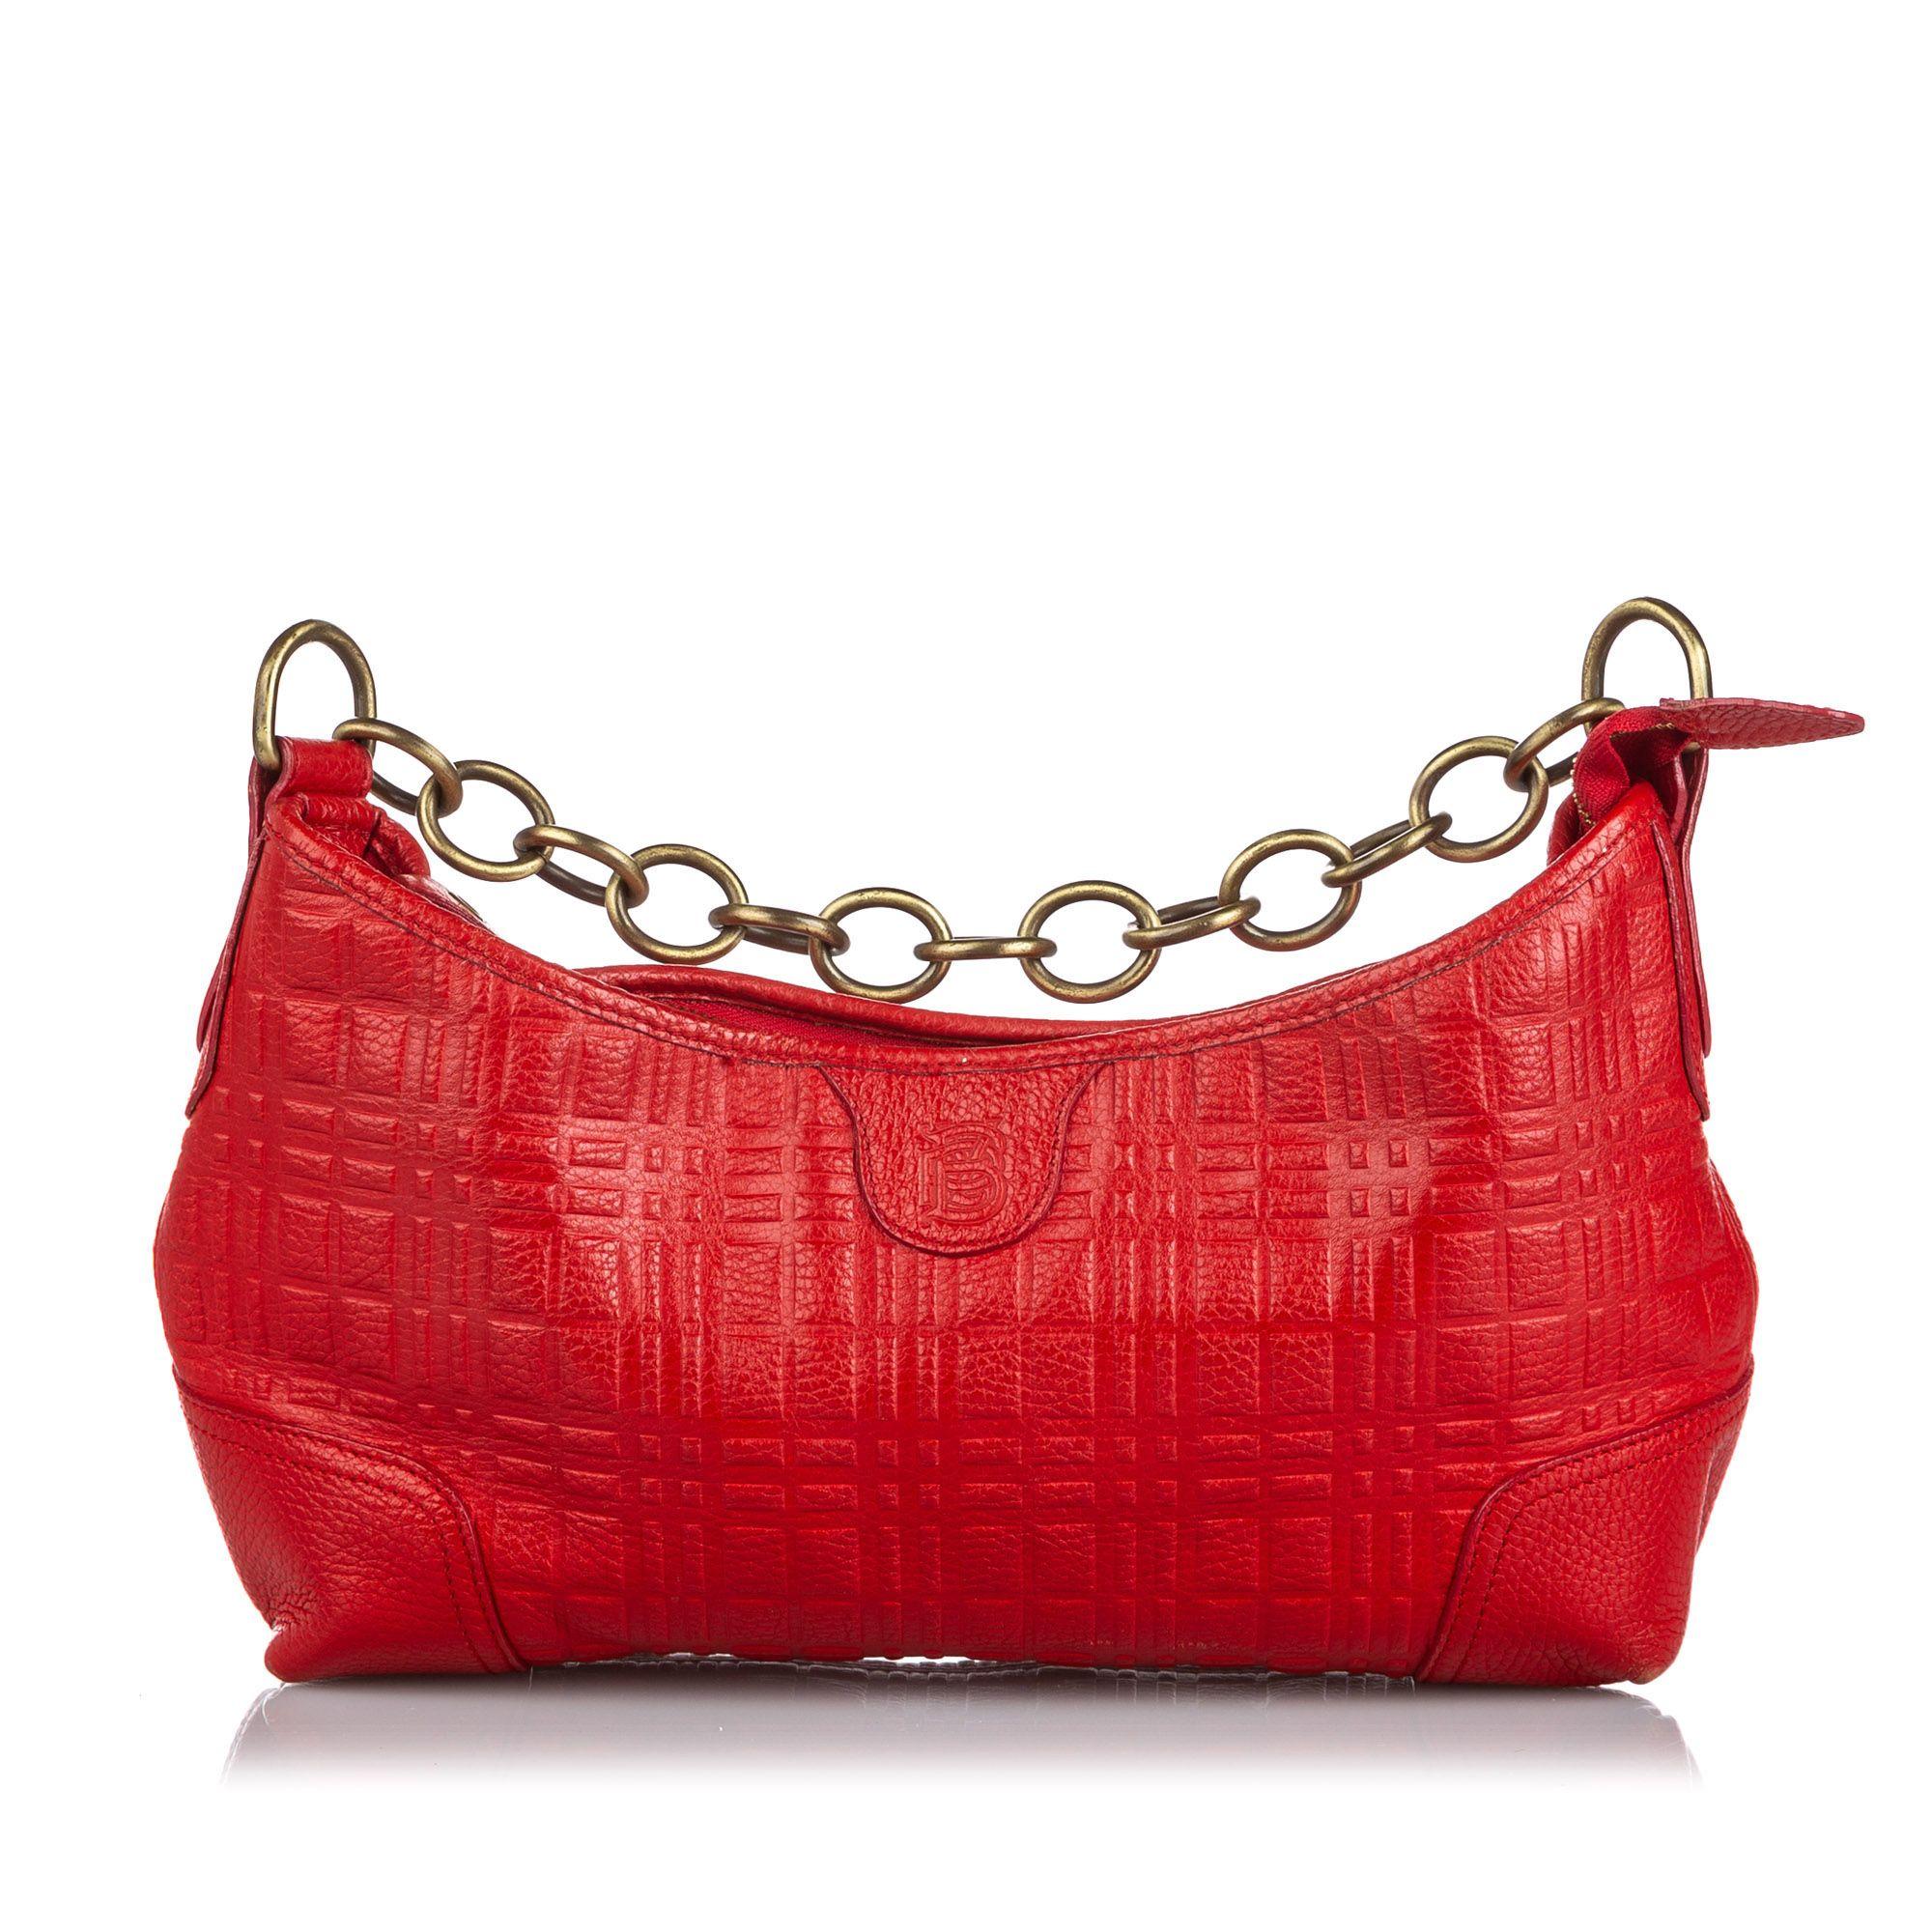 Vintage Burberry Leather Chain Shoulder Bag Red